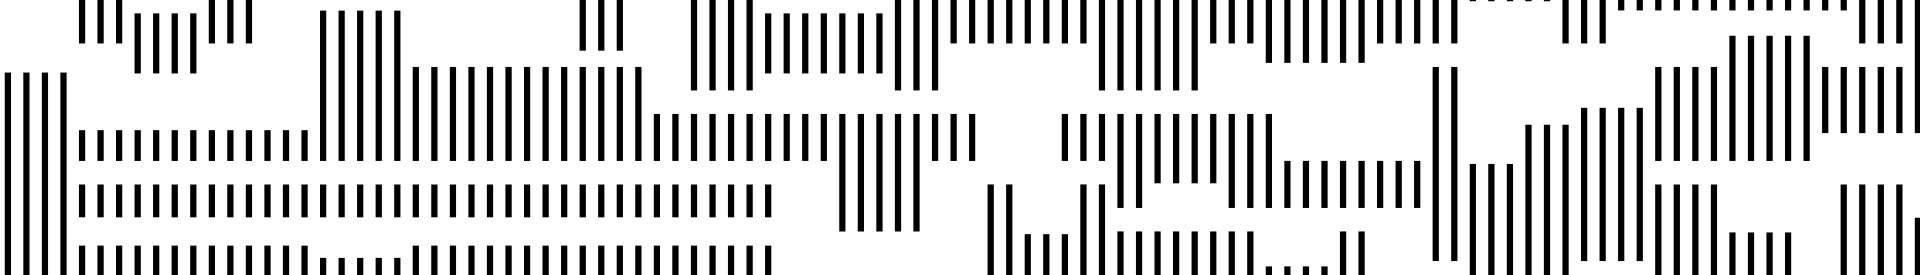 Radiator_Linear_1.jpg